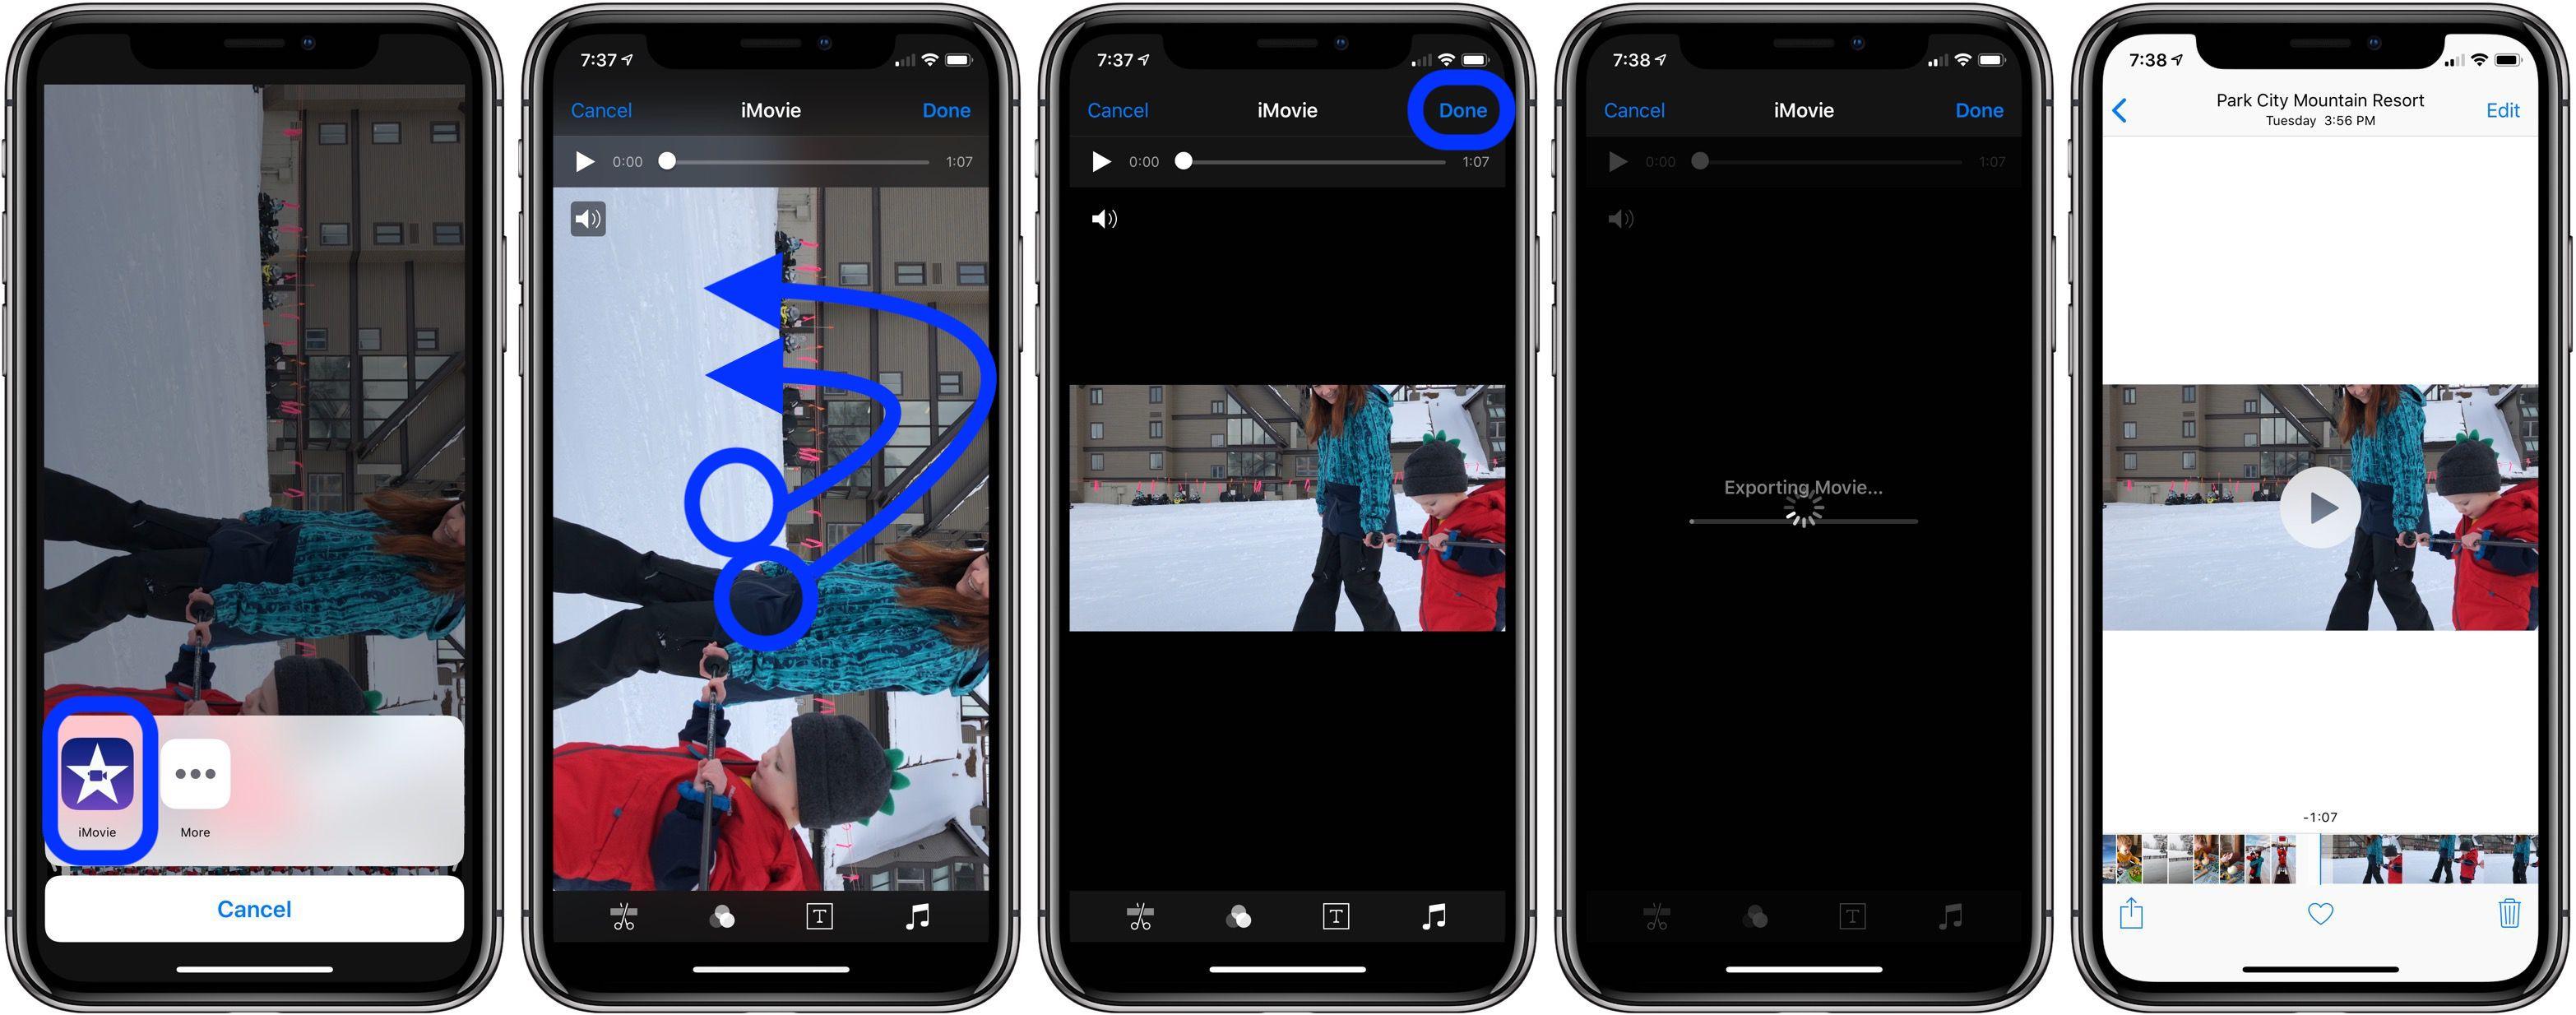 iphone video orientation